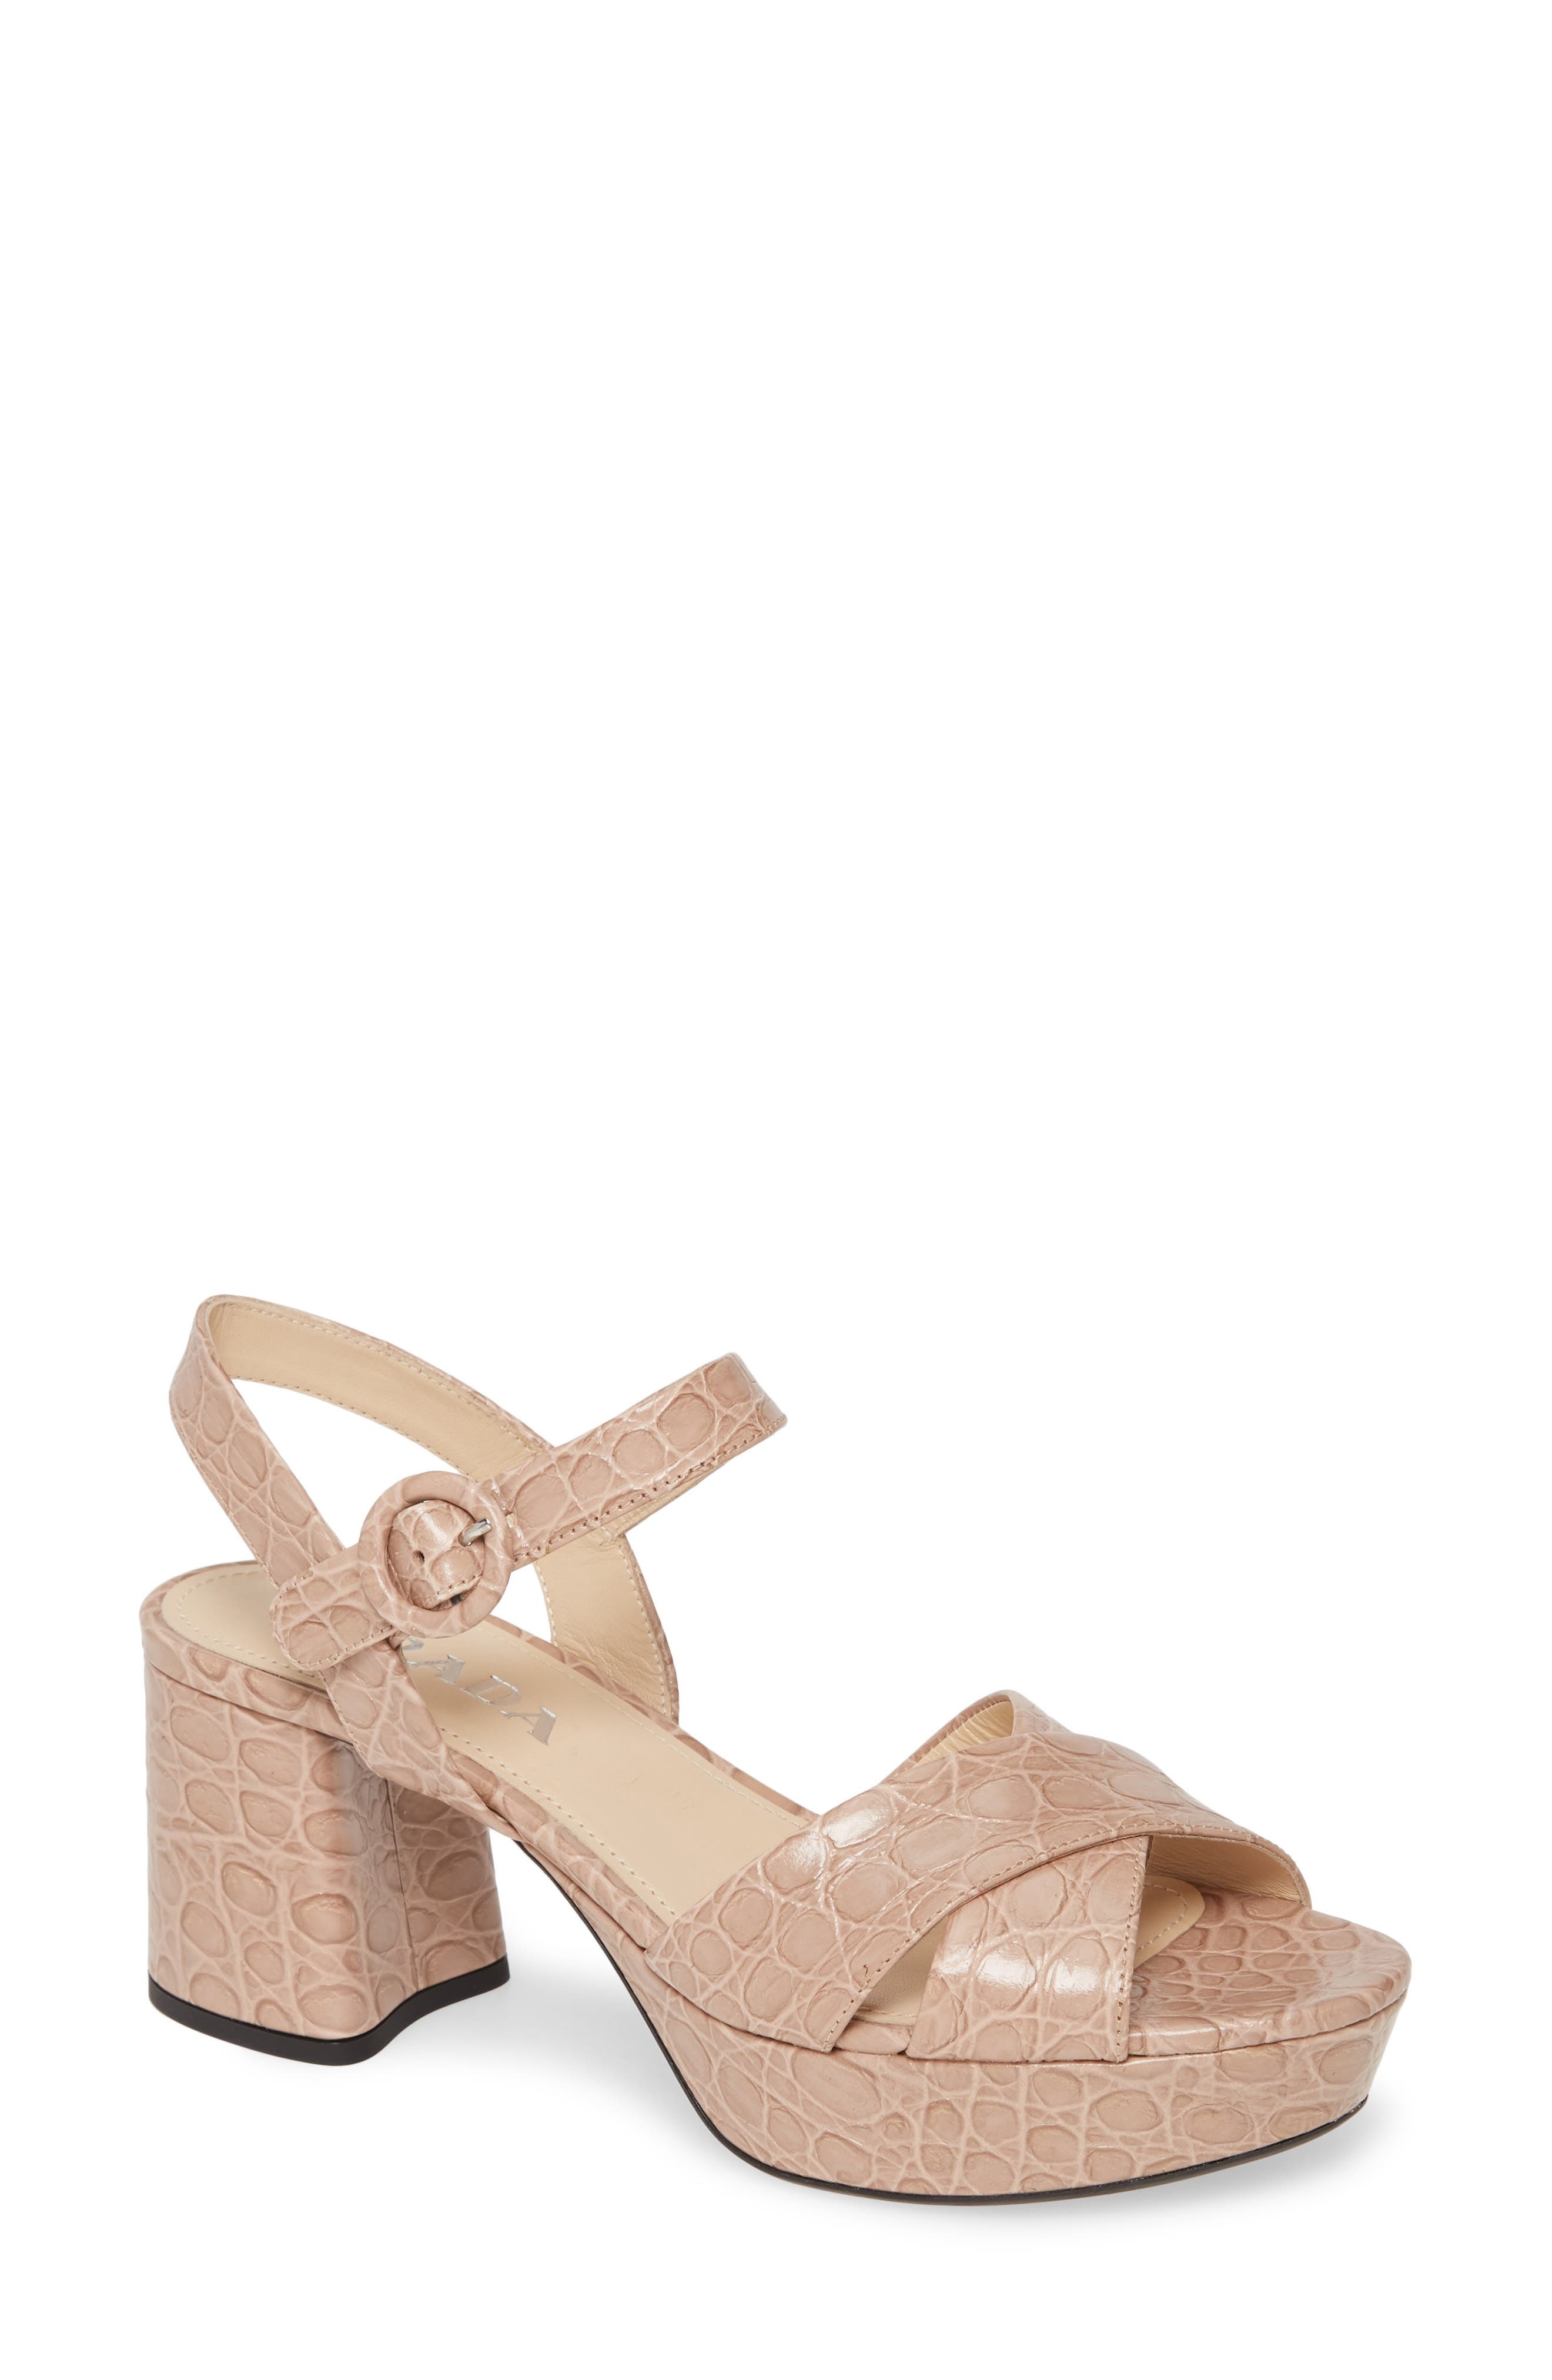 Prada Raffia Platform Wedge Sandal In